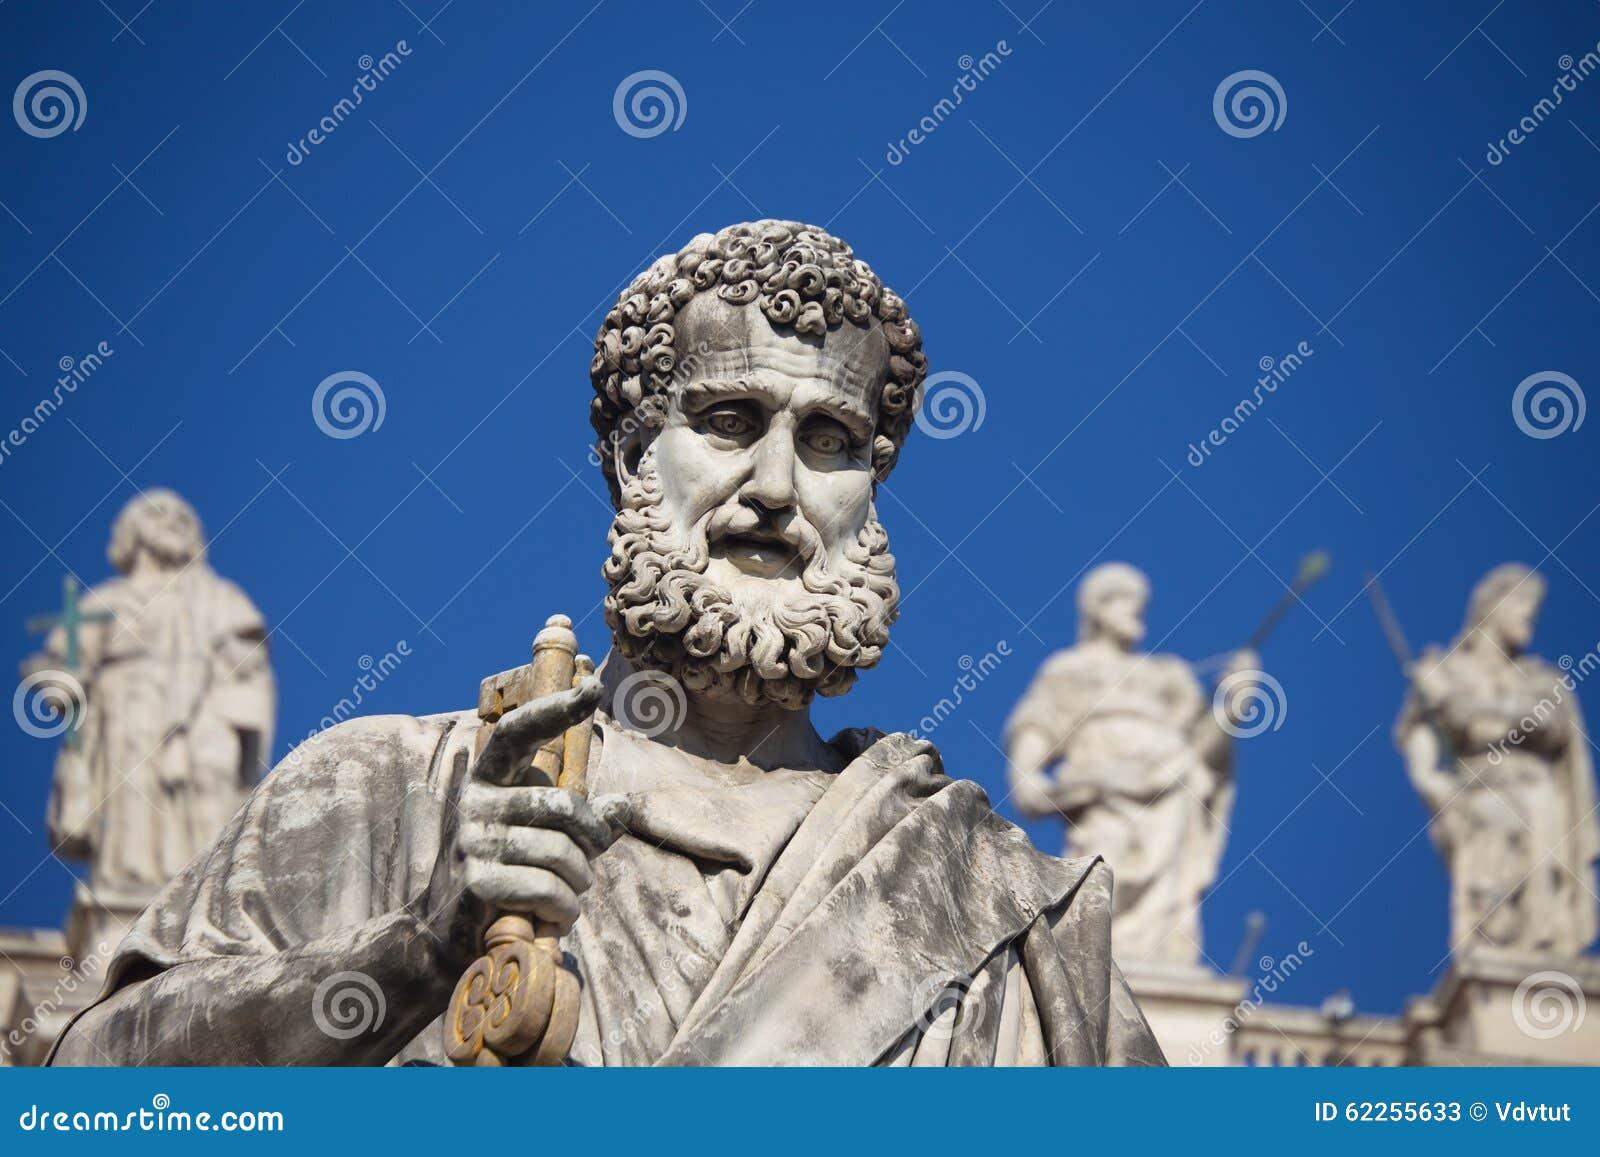 Obras maestras antiguas de Roma, Roma